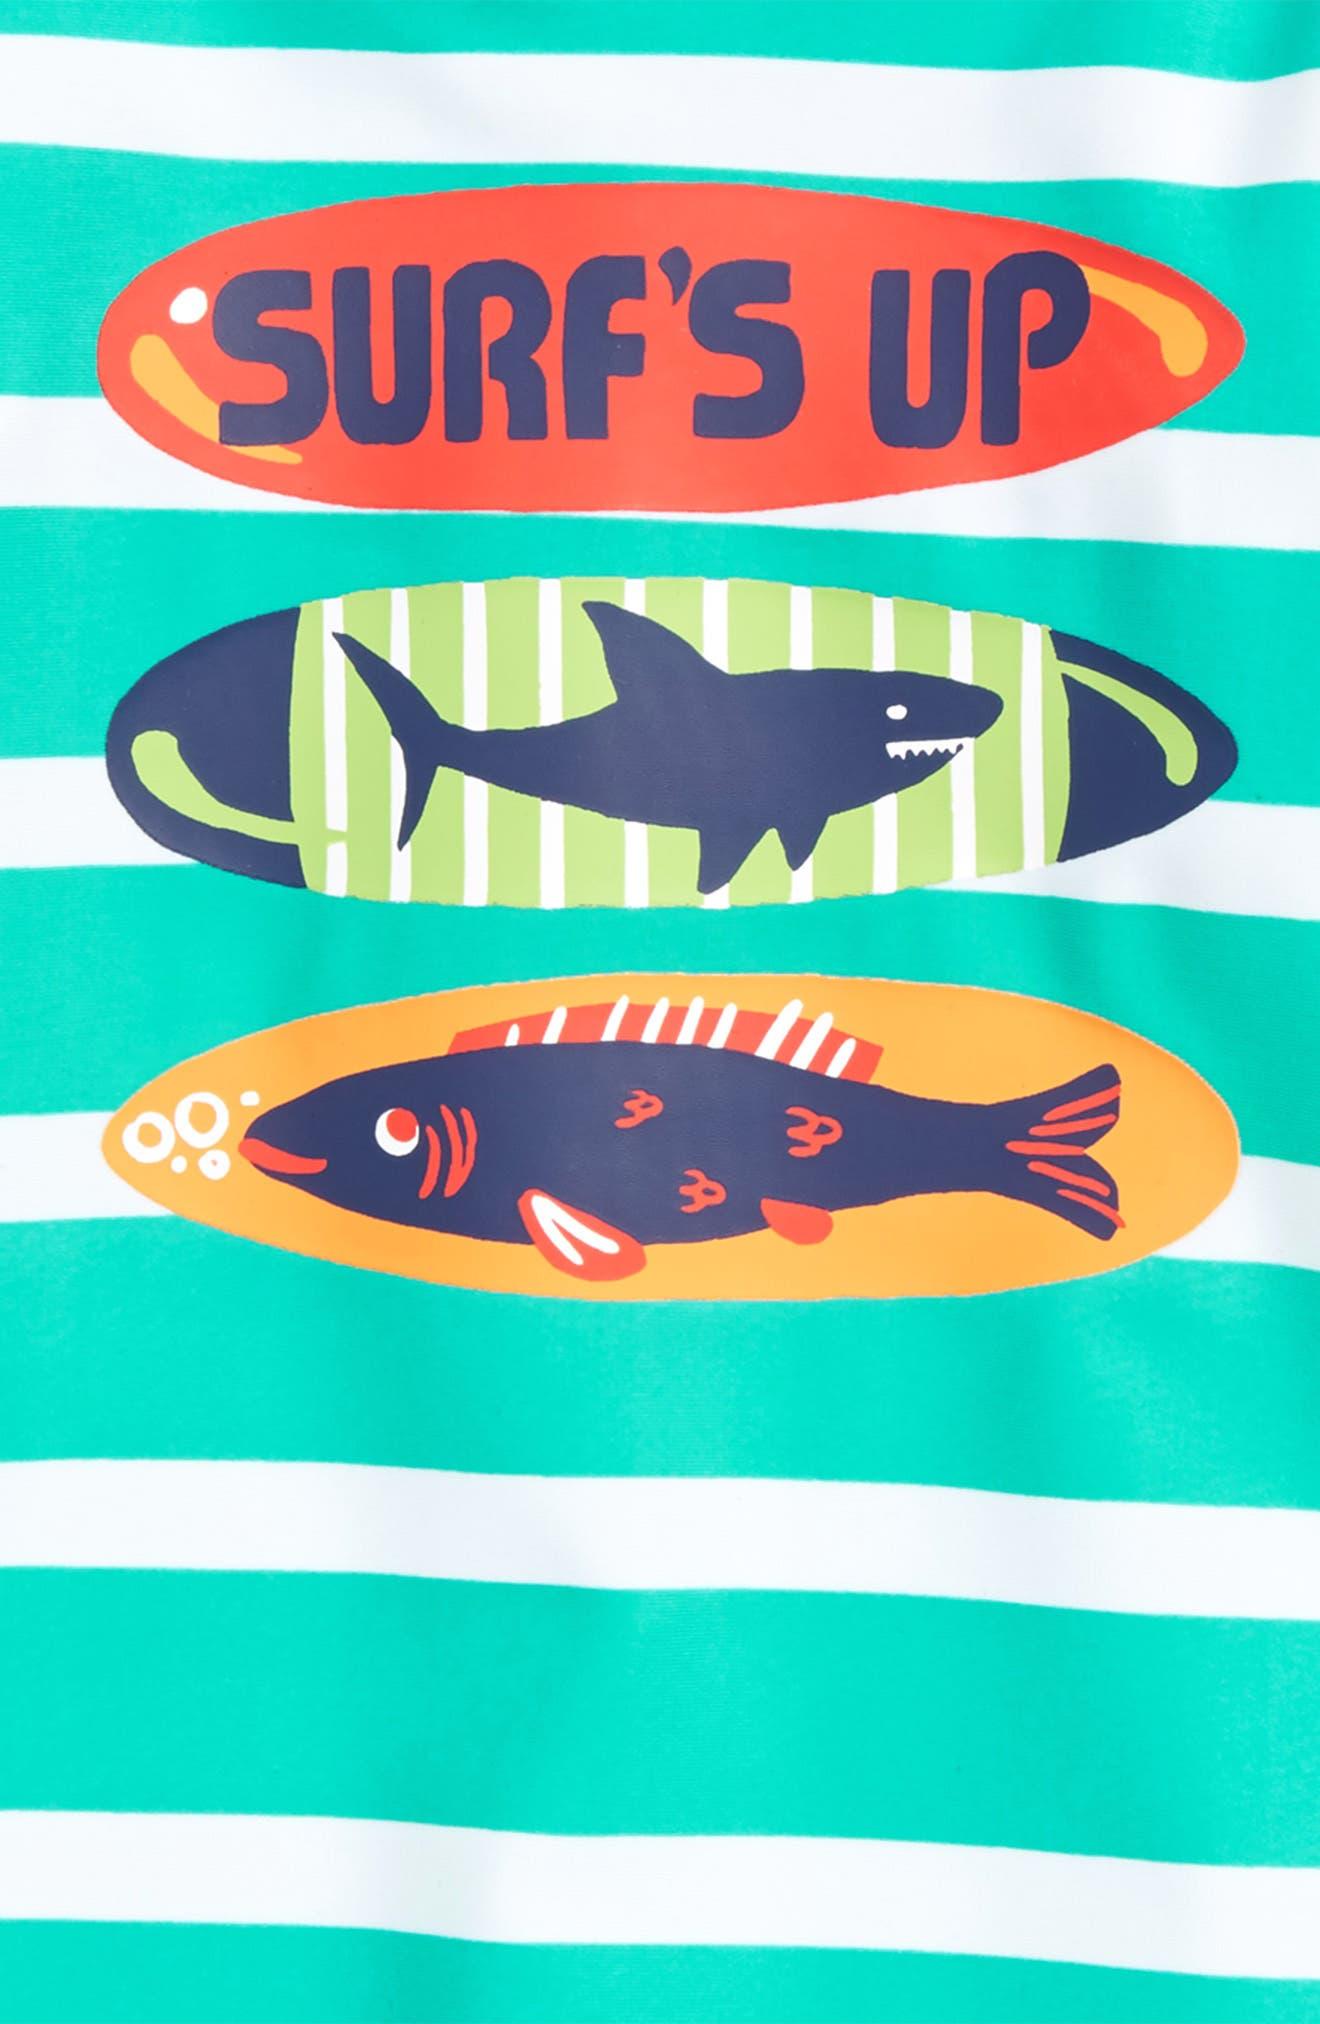 Surfboards One-Piece Rashguard Swimsuit,                         Main,                         color,